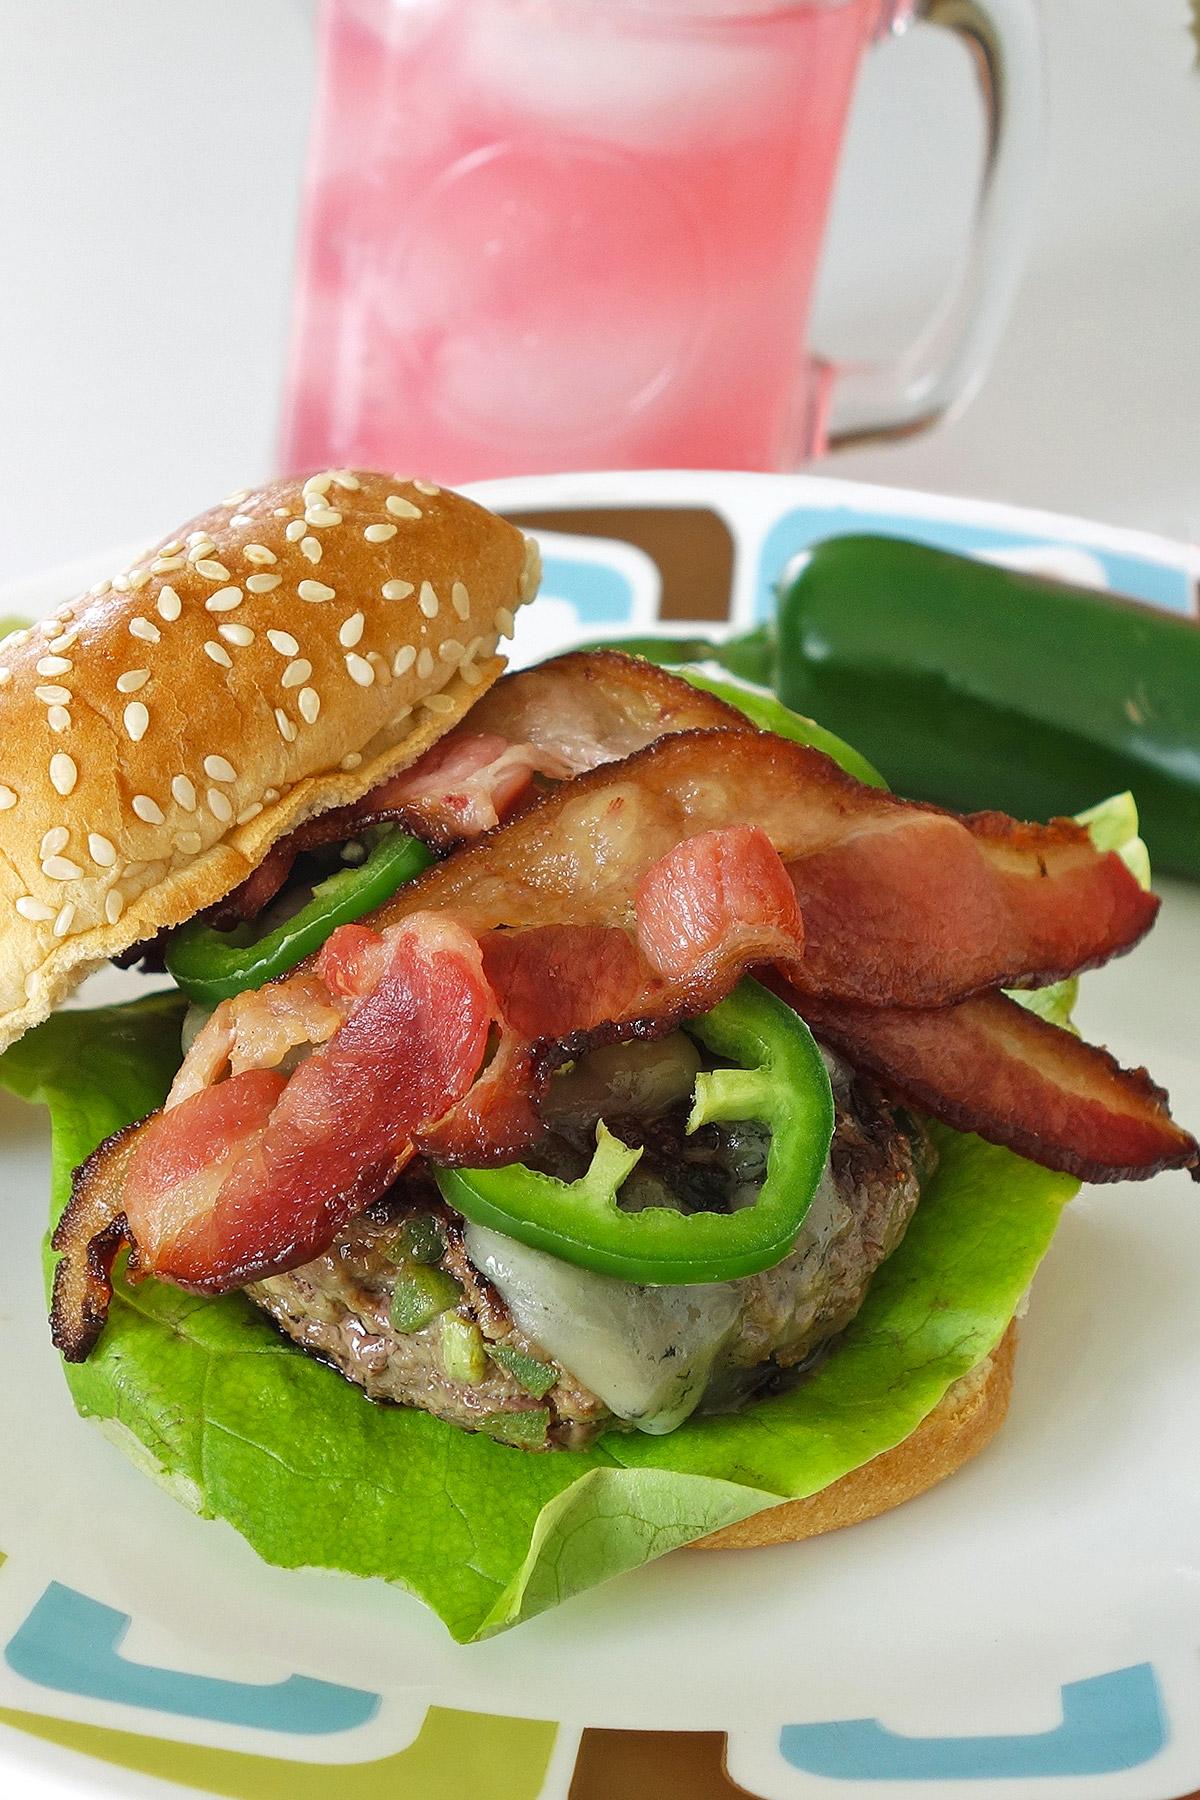 Jalapeno and Blue Cheese Burger | burgerartist.com